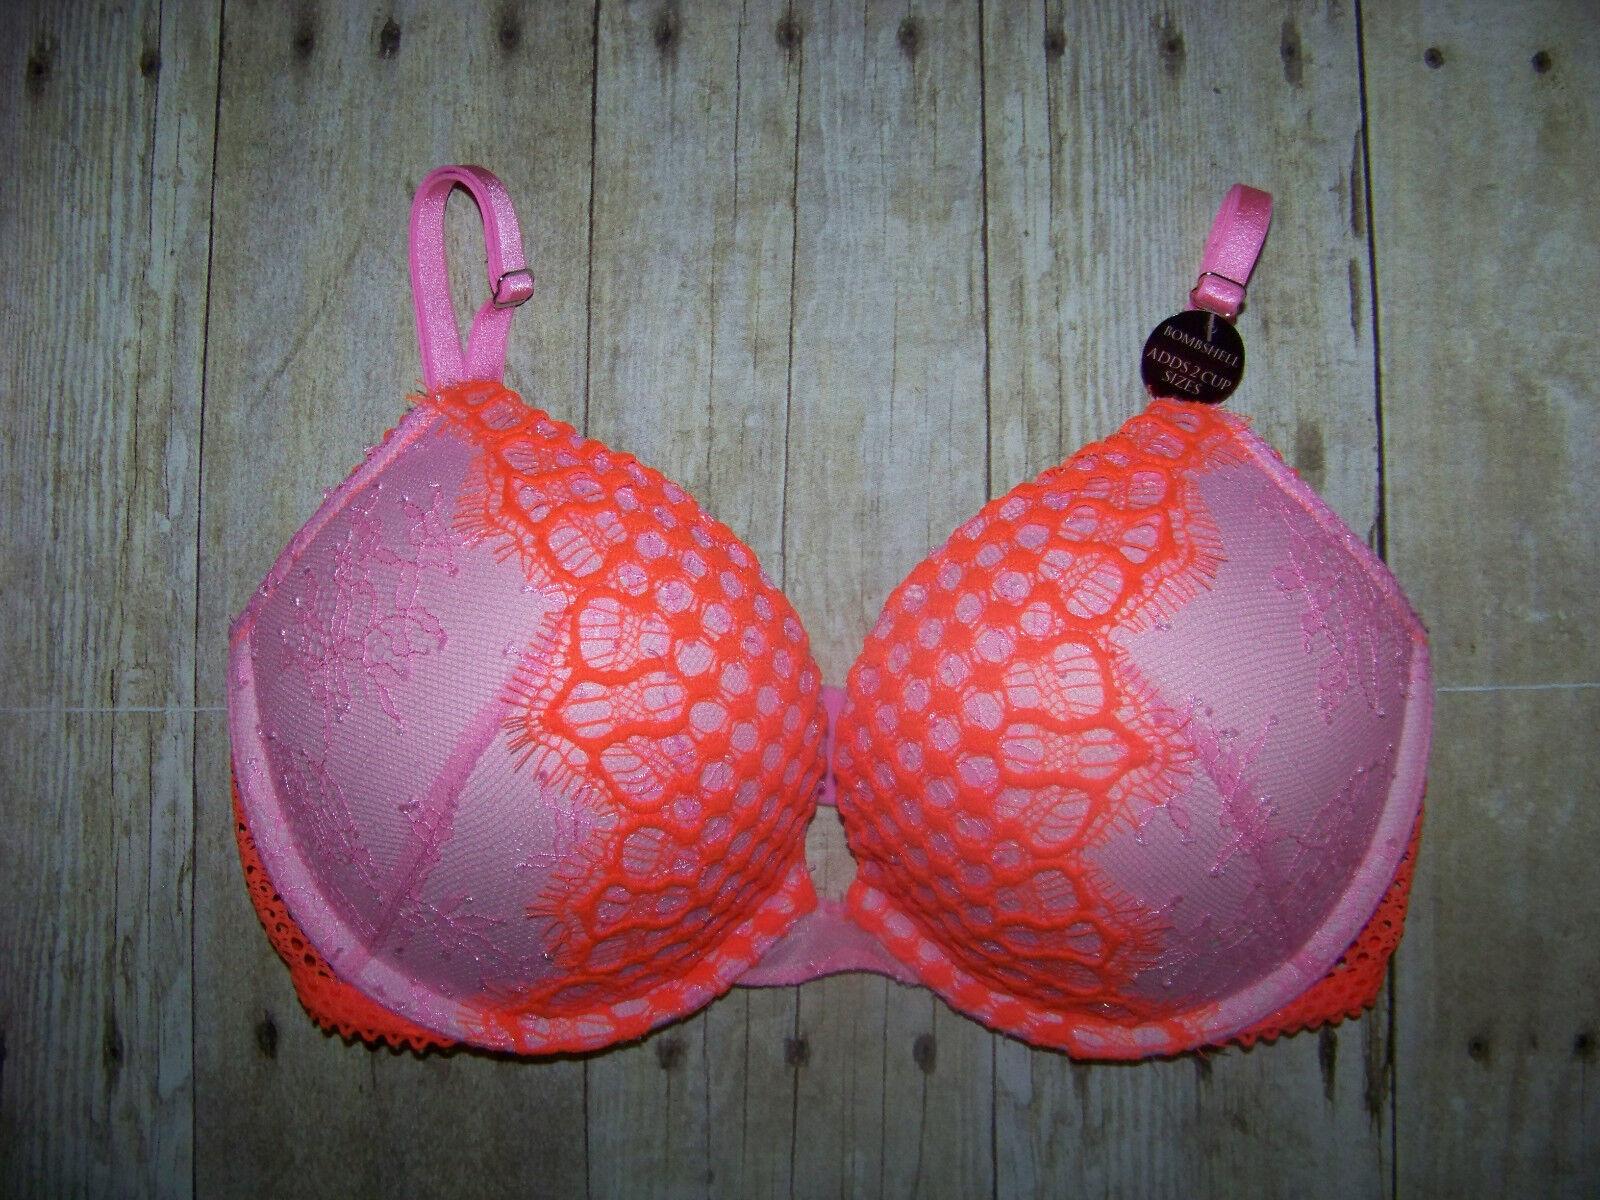 7a01bb25ef477 Victoria s Secret Bombshell Plunge Bra NWT 32D